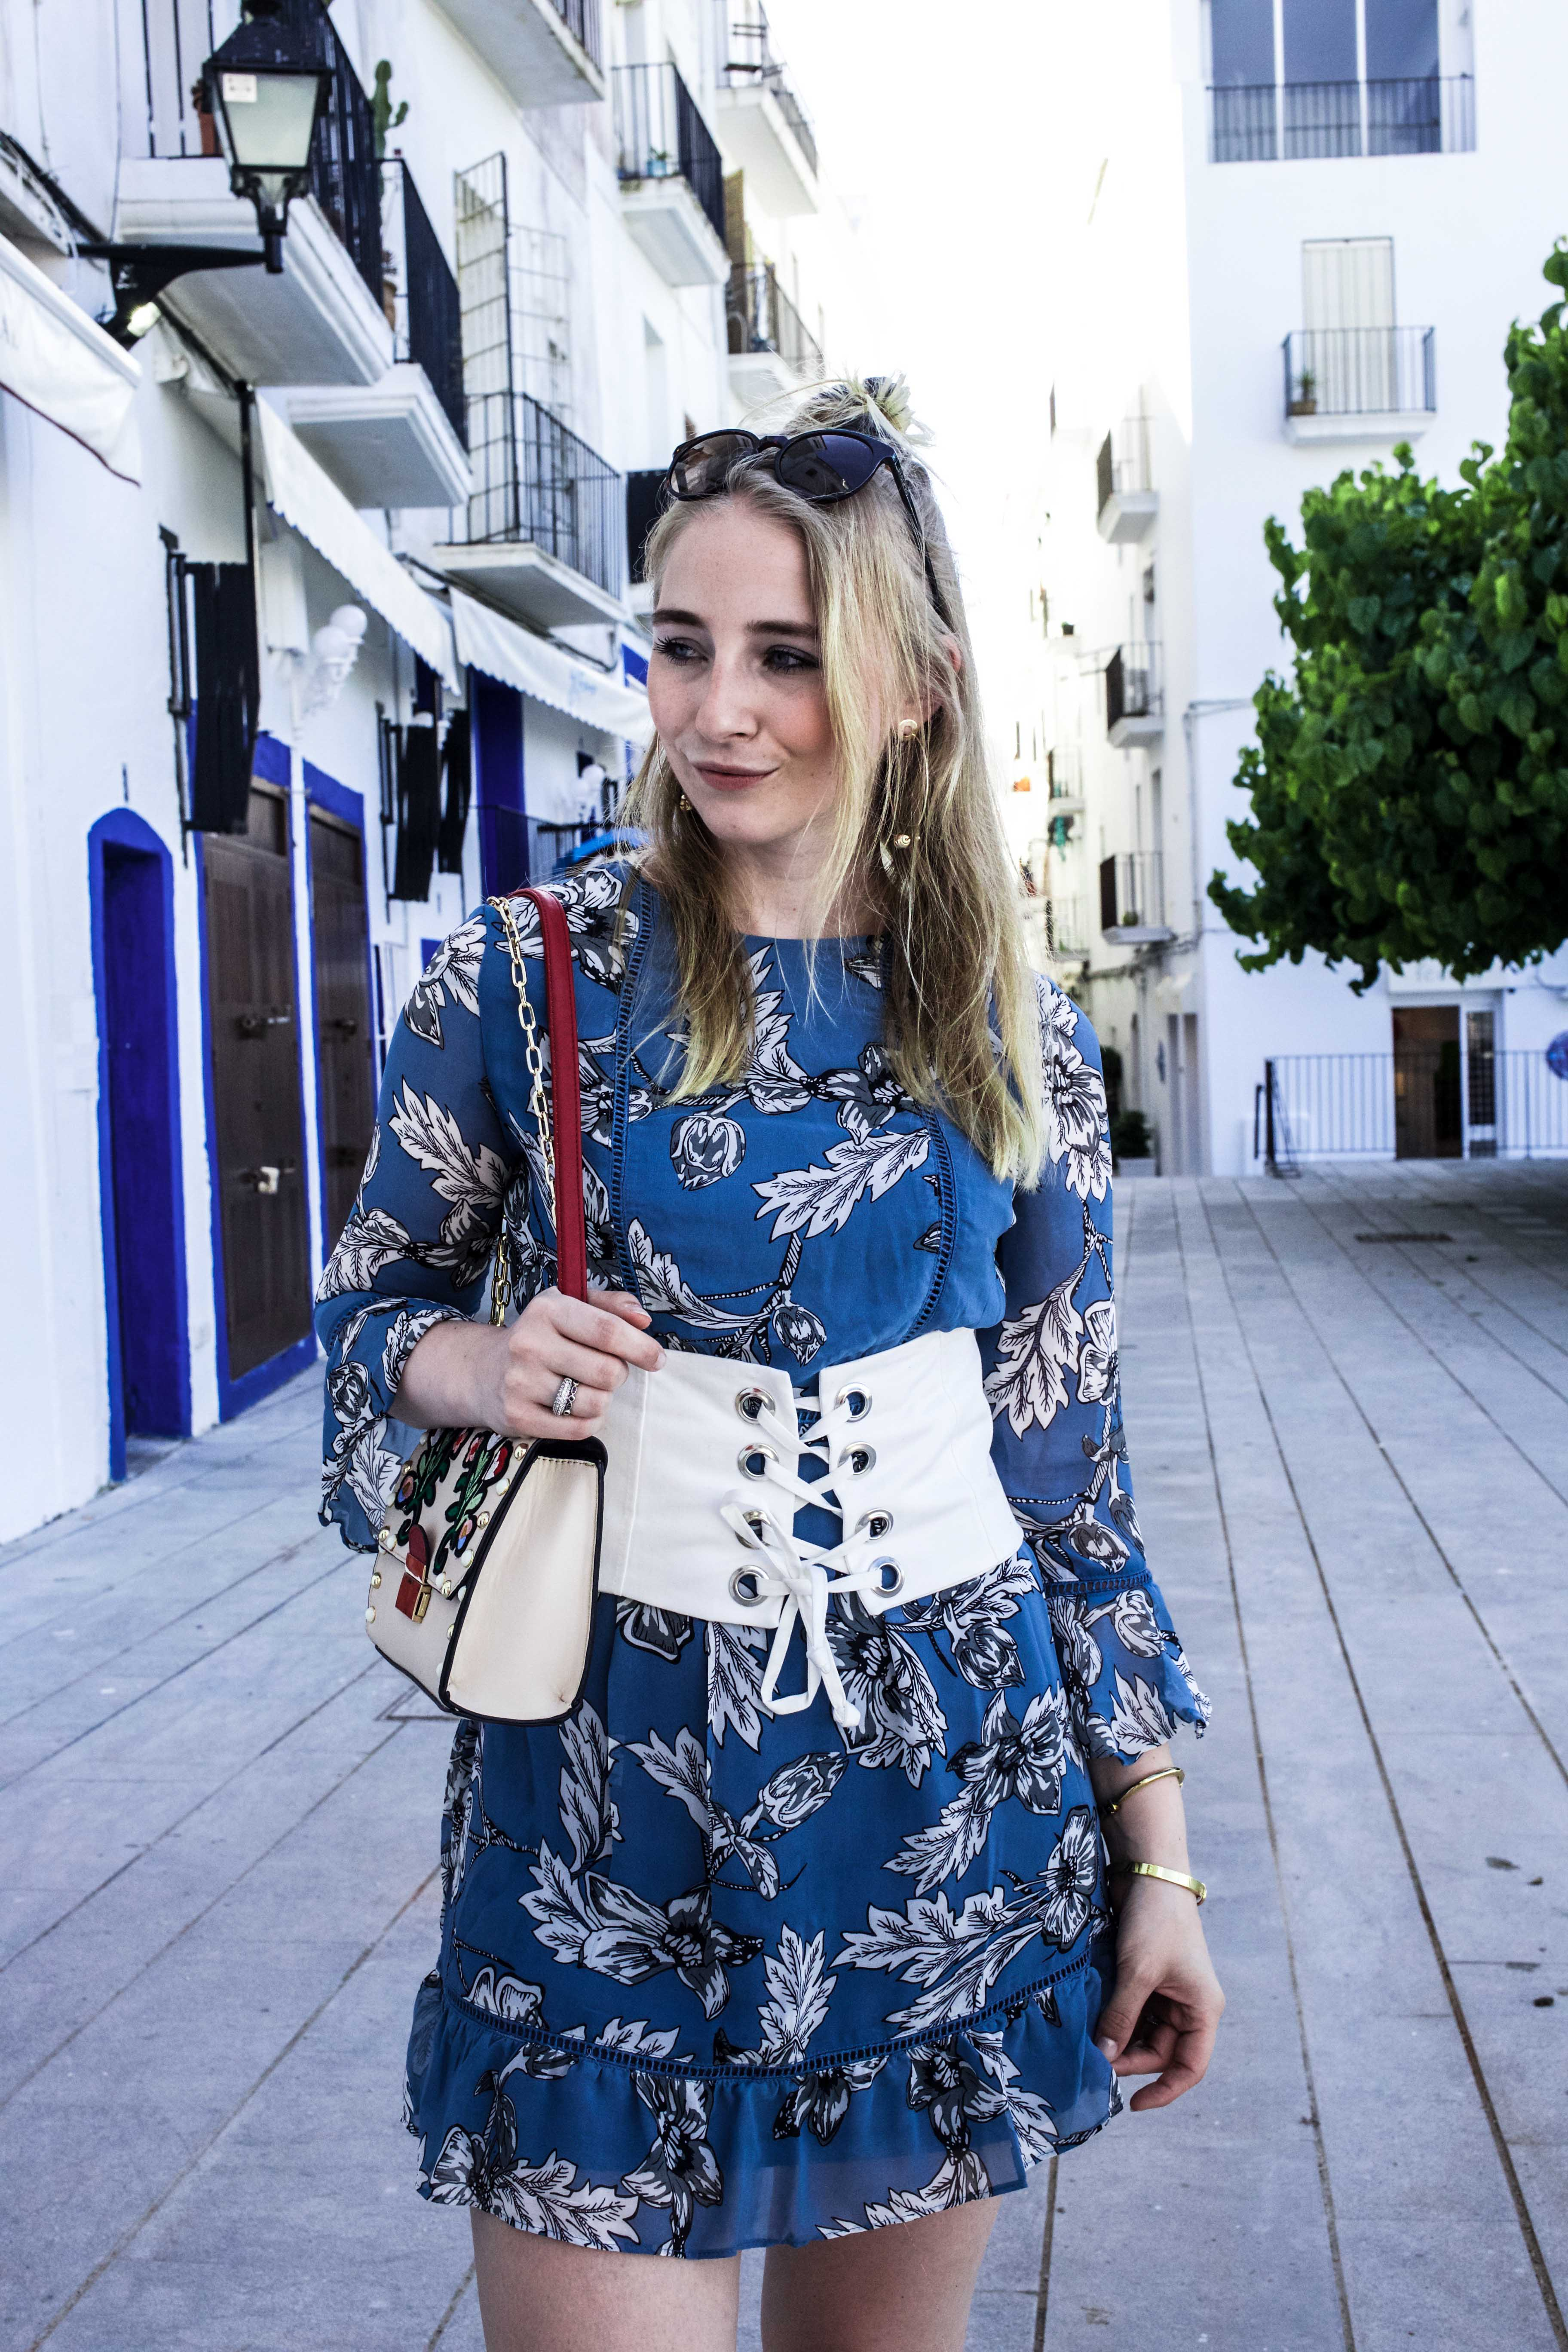 trend-report-taillengürtel-espadrilles-sommerlook-ibiza-modeblog-fashionblog-fashionvernissage_9549